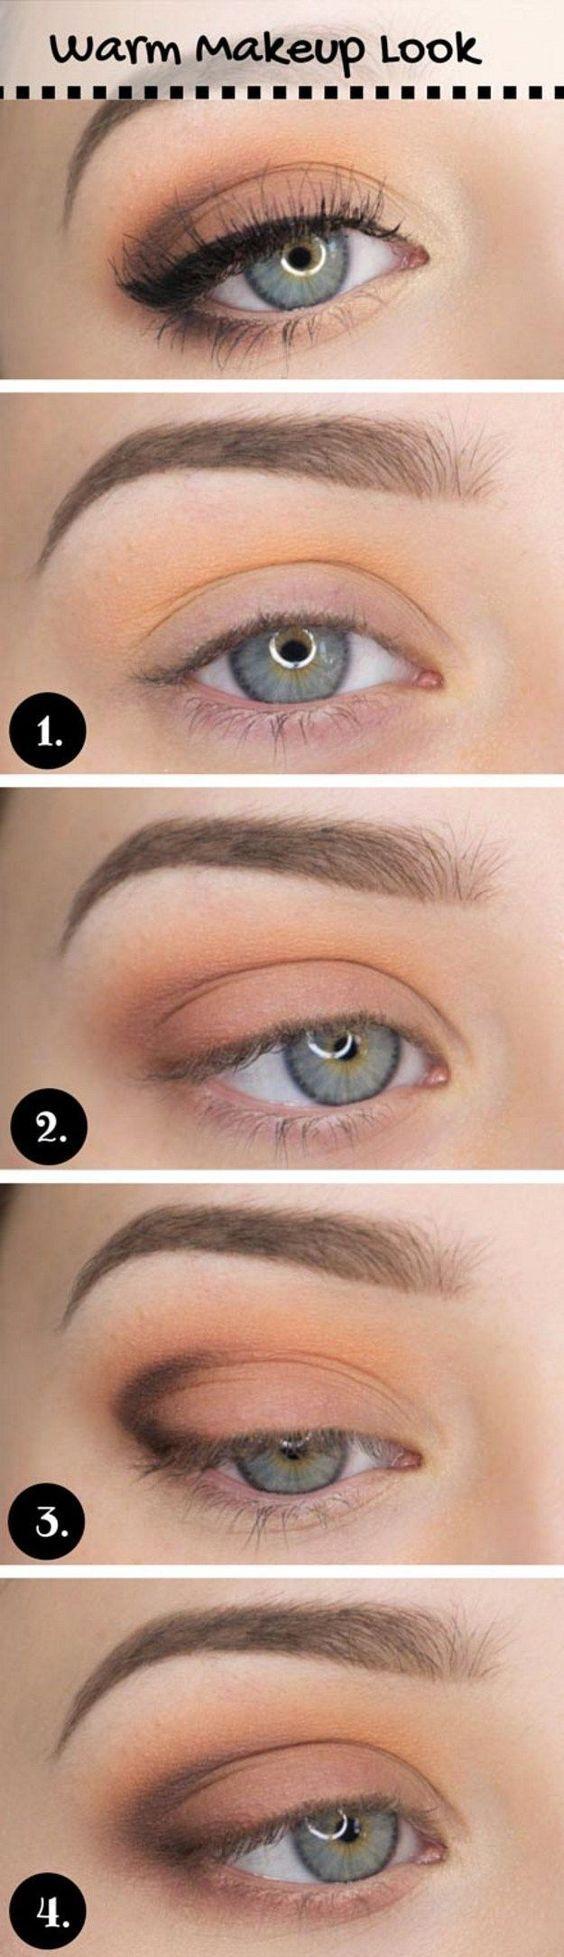 How to Do Casual Makeup Look | Everyday Makeup by Makeup Tutorials at www.makeup...